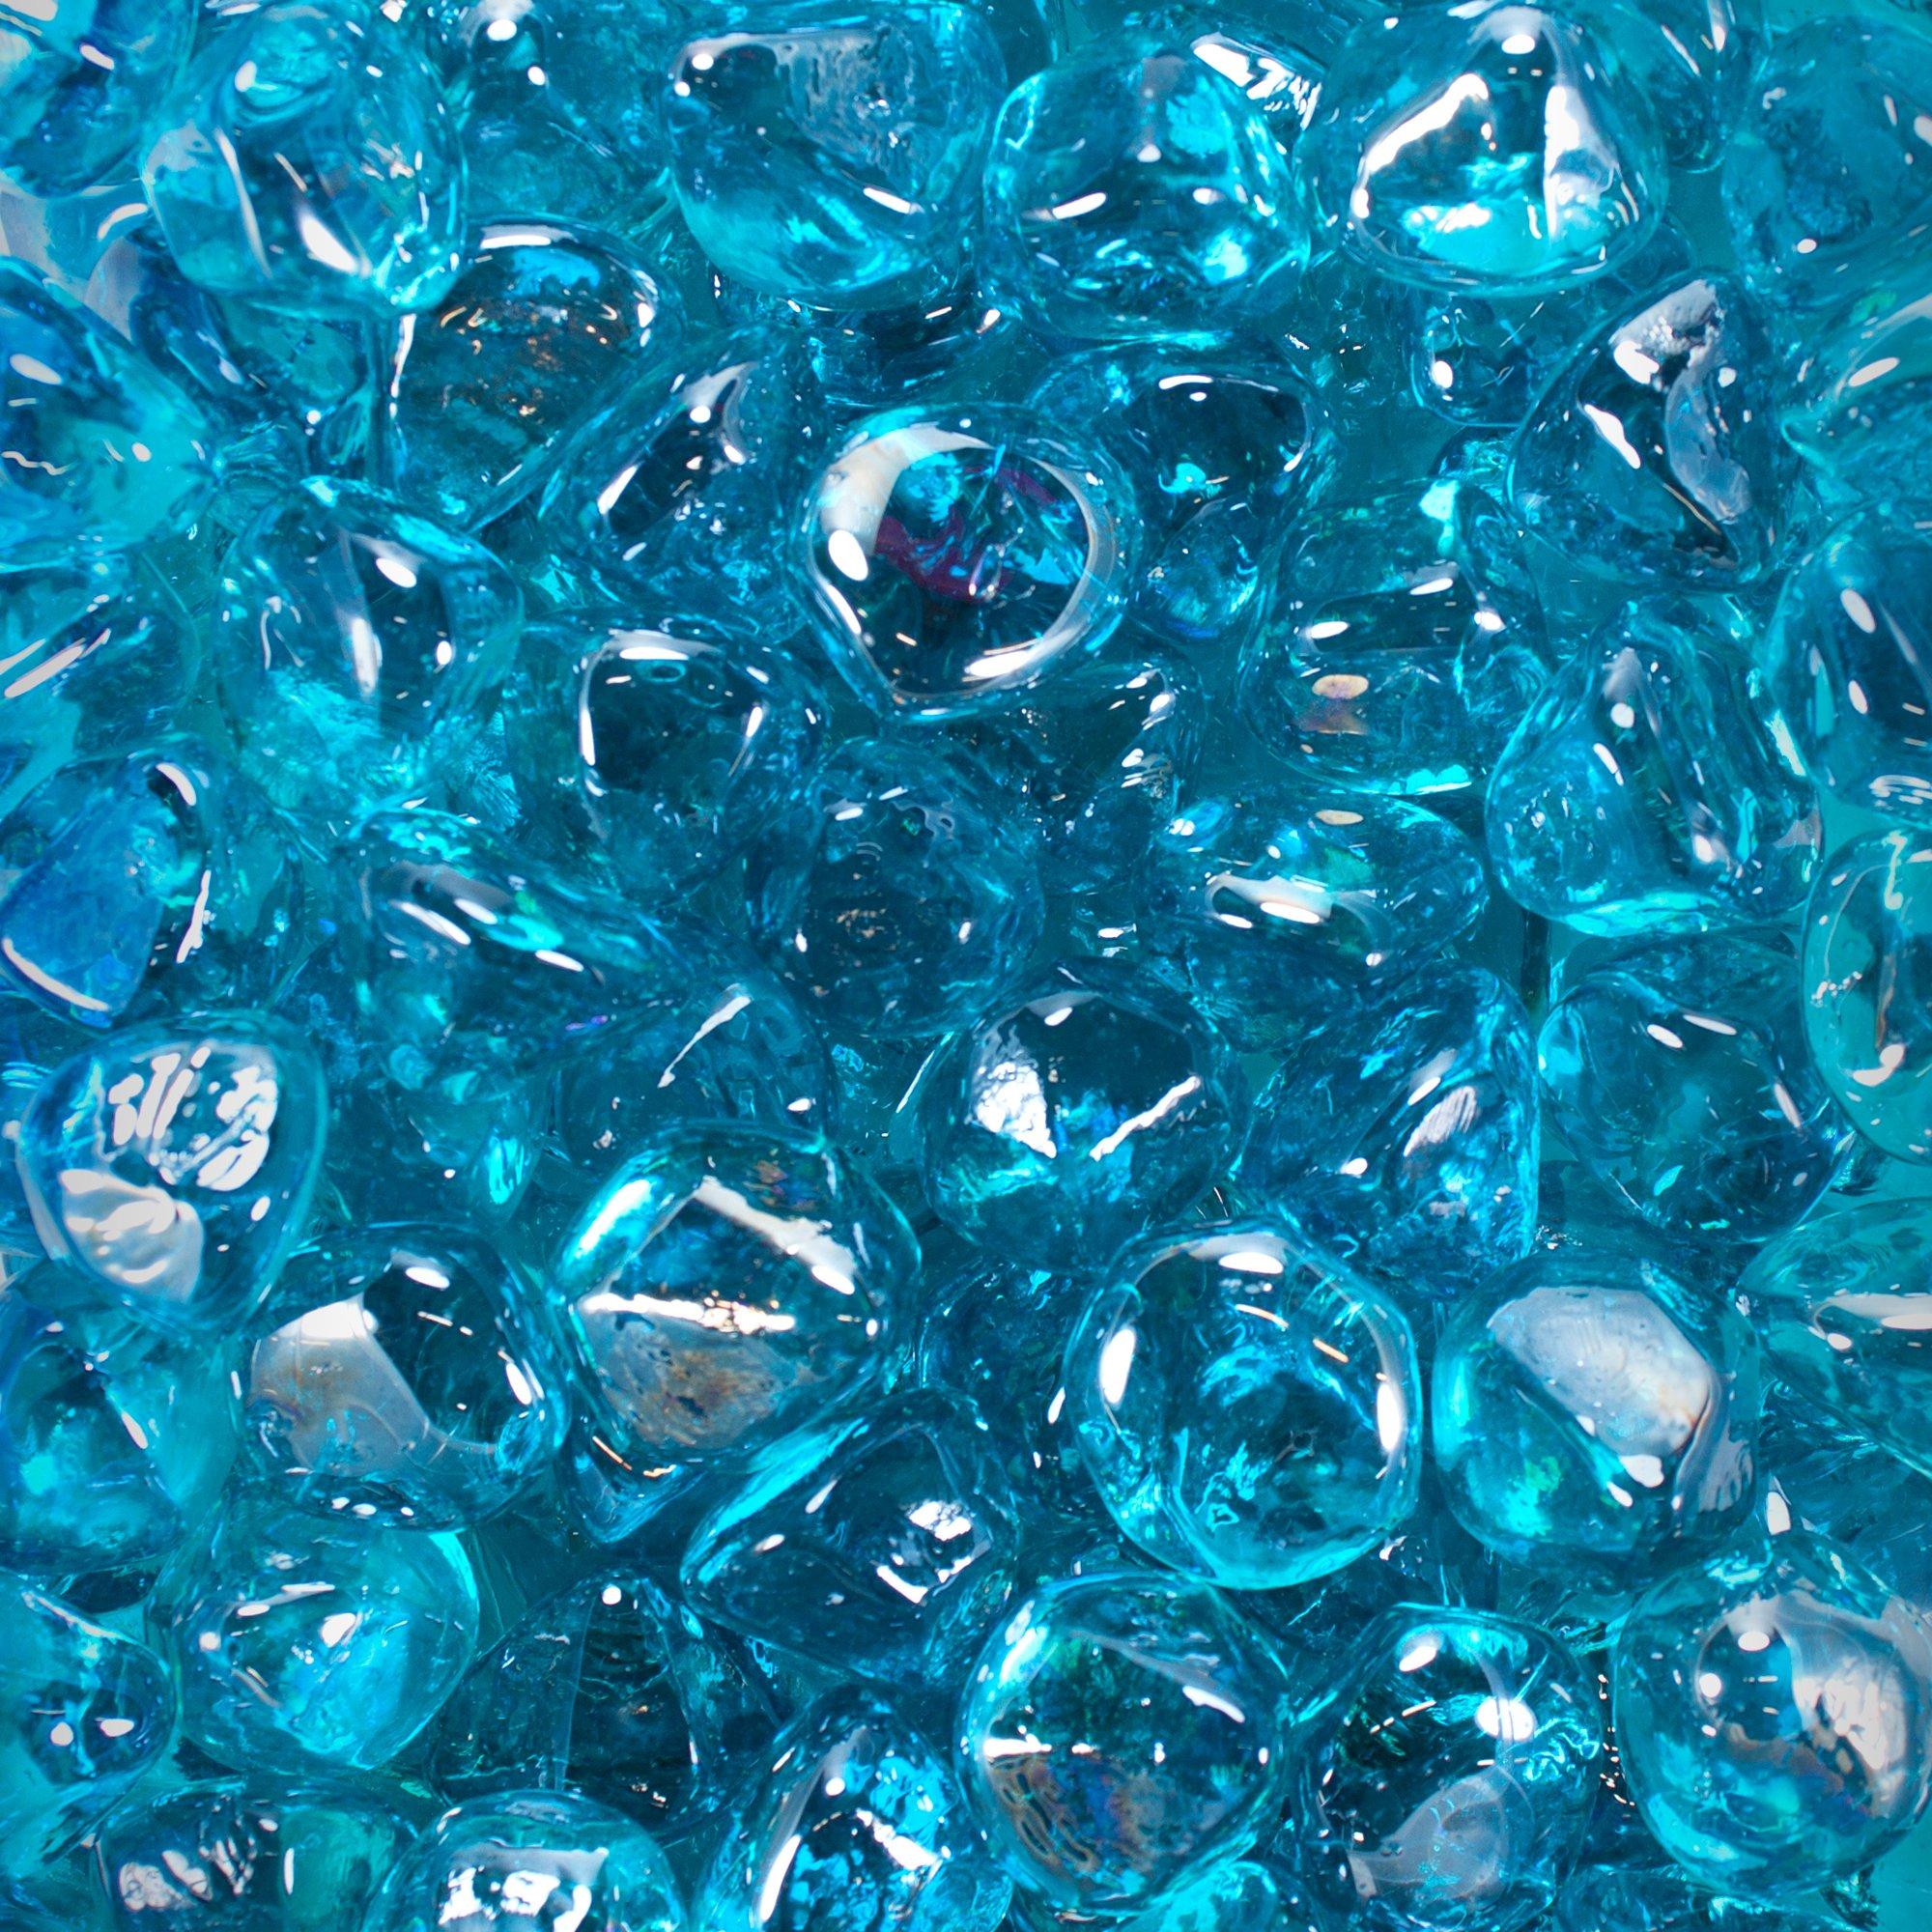 Celestial Fire Glass Diamonds - Tropical Blue Luster | 10 Pound Jar